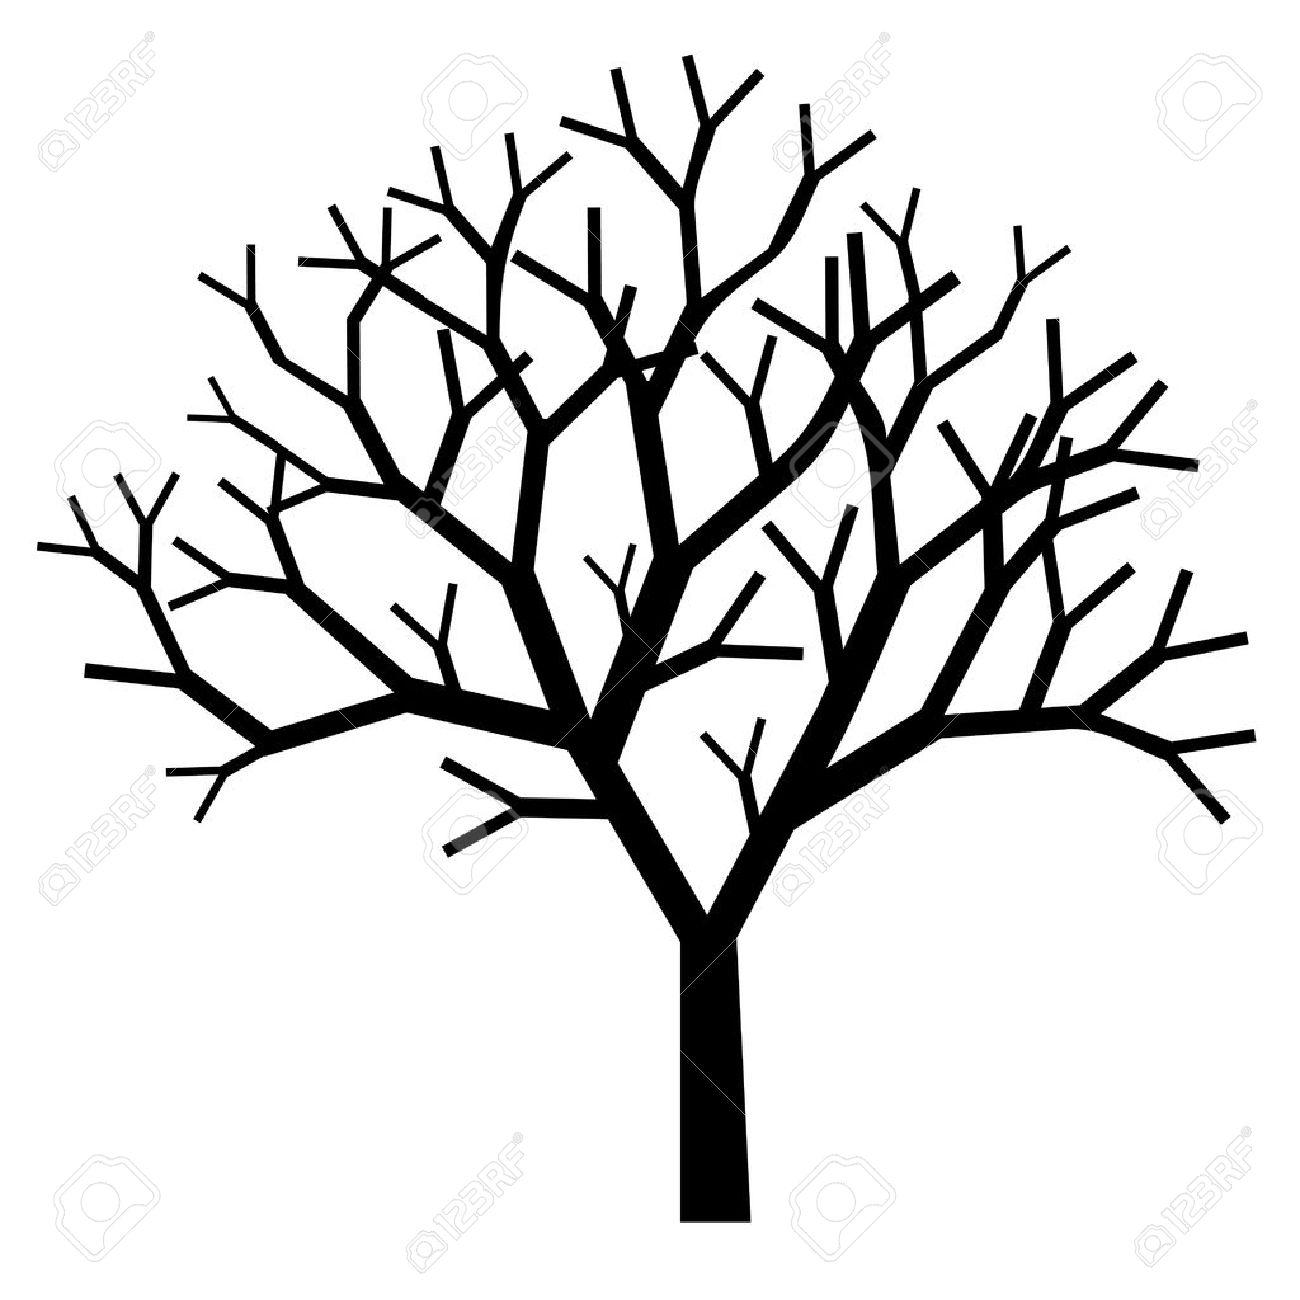 1300x1300 Barren Clipart Bare Tree Branch